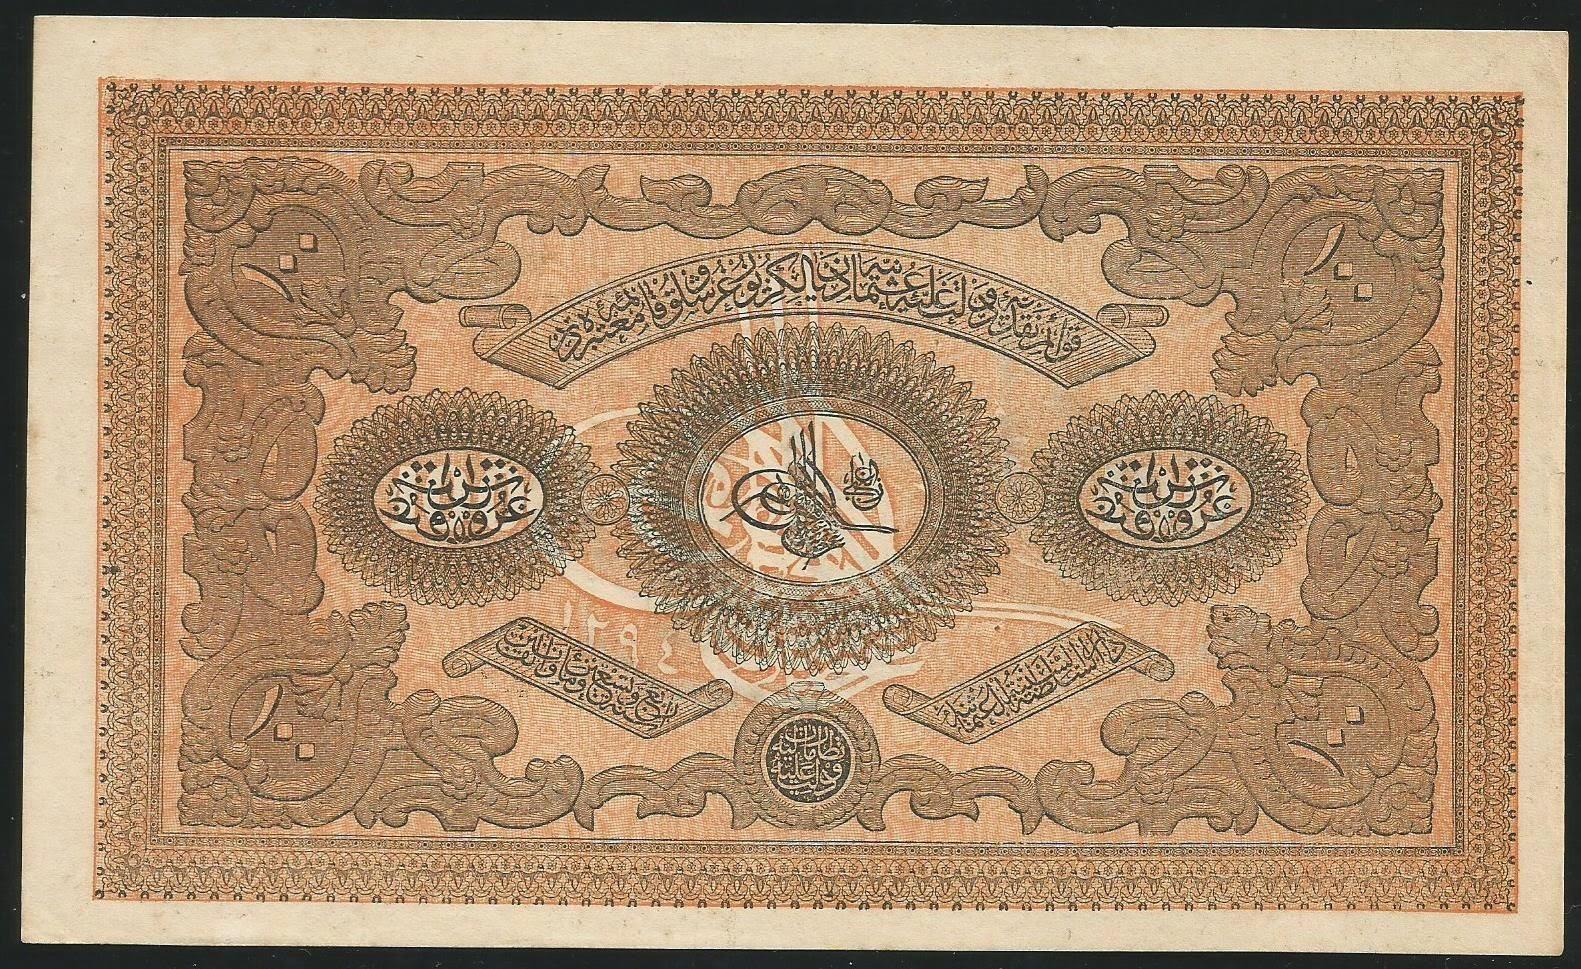 Turkey banknotes Ottoman Empire 100 Kuruş bank note 1877